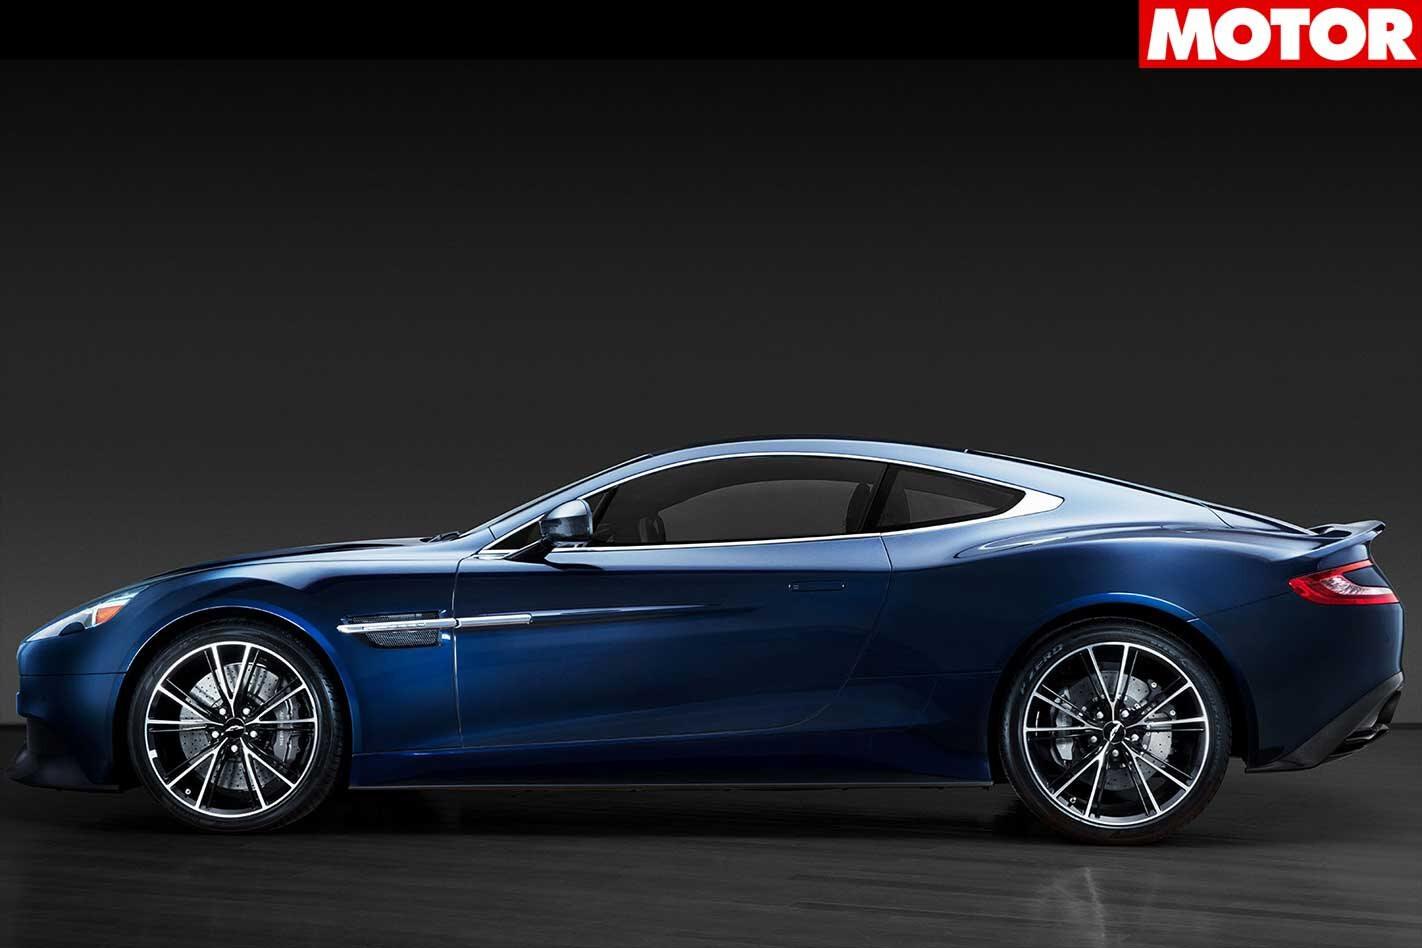 Daniel Craig Aston Martin Vanquish to be auctioned